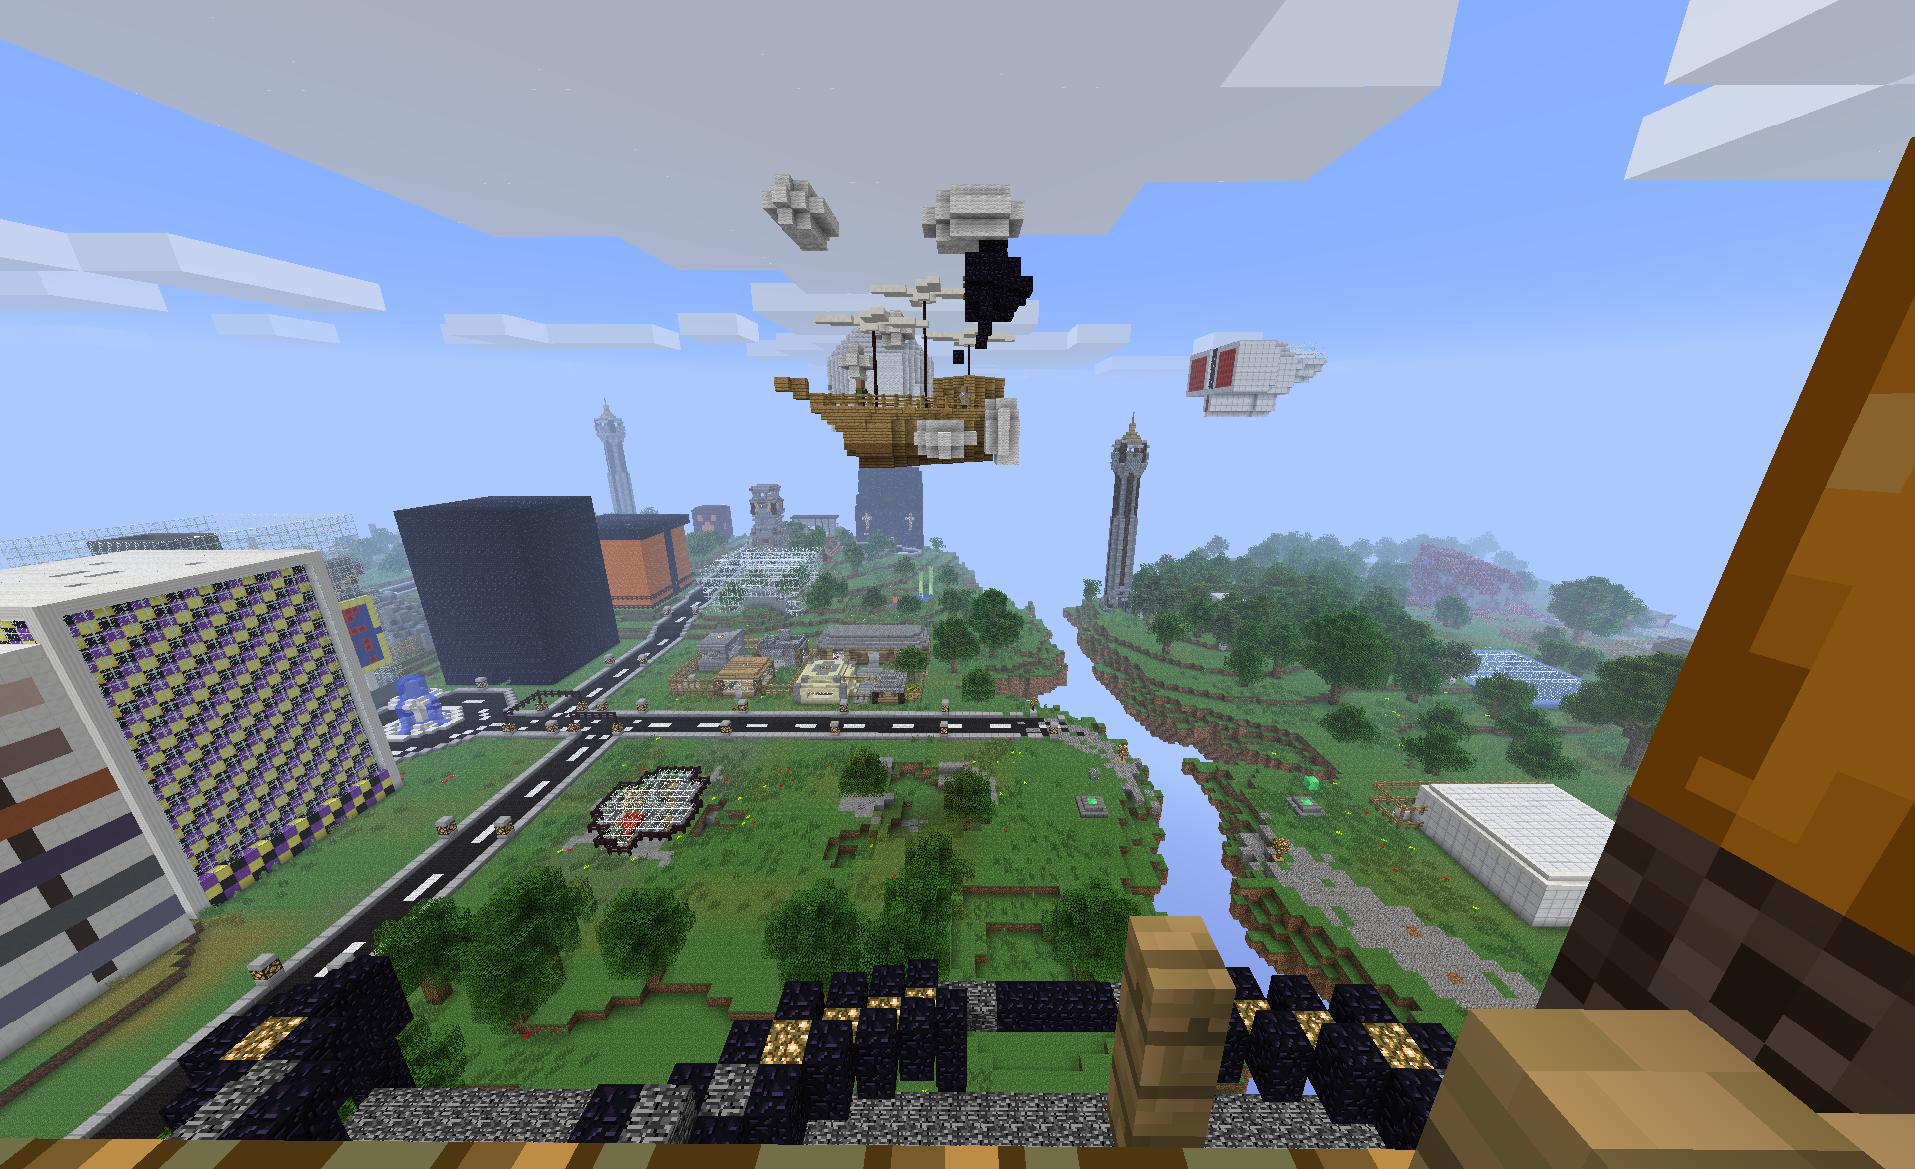 http://minecraft-forum.net/wp-content/uploads/2013/10/95f9d__Adventure-Multiplex-2-The-Village-Map-1.jpg